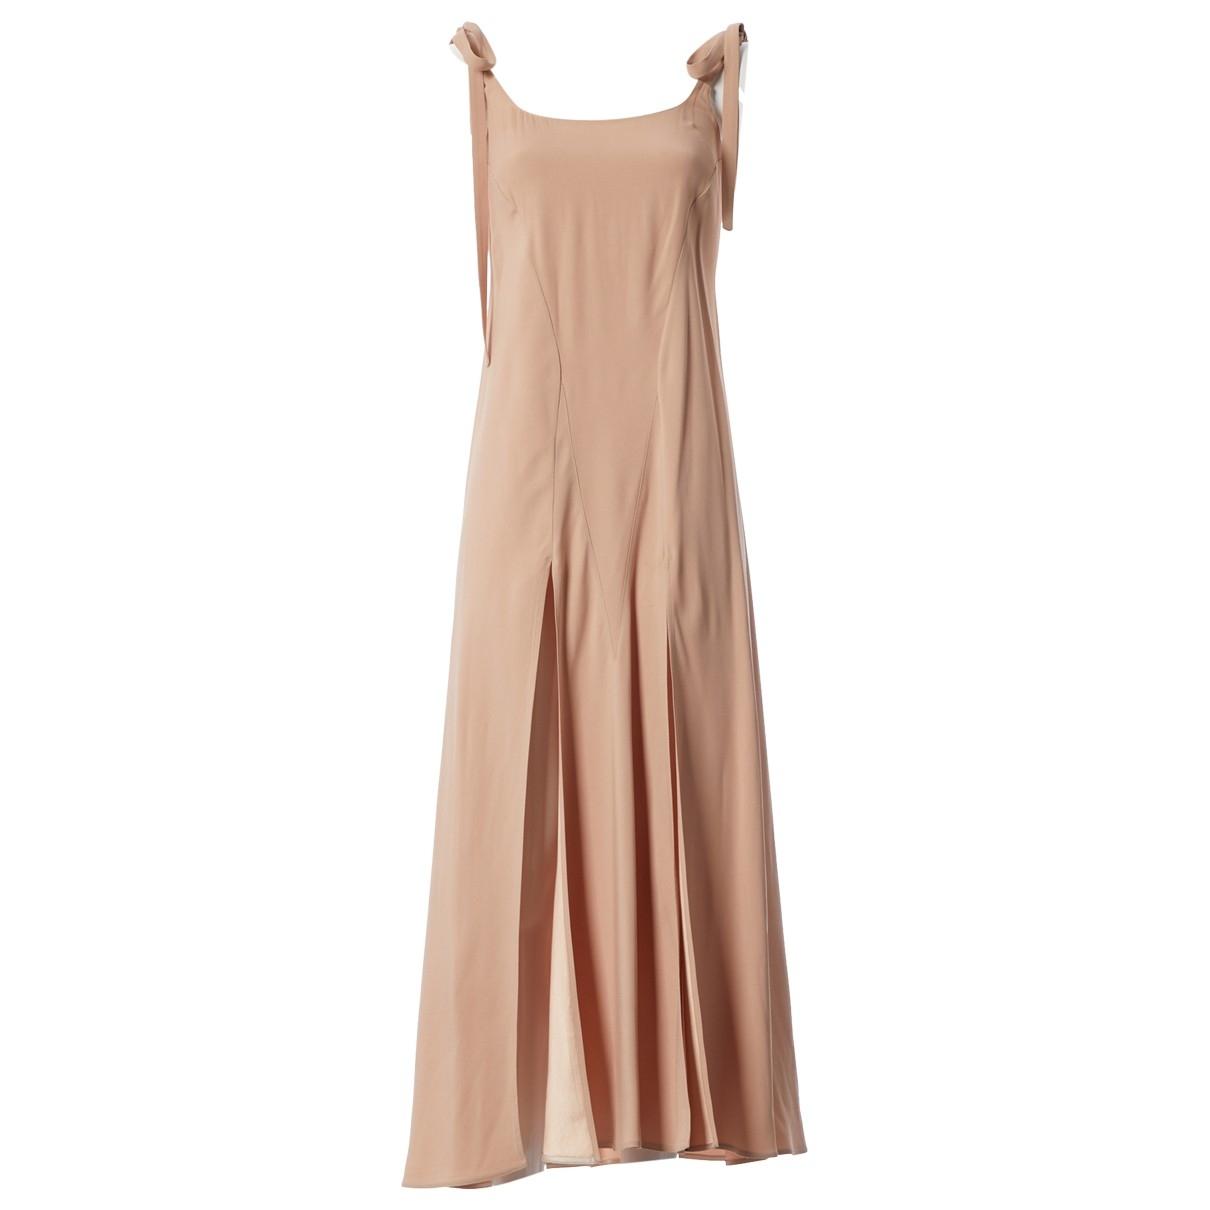 Attico \N Pink dress for Women 1 0-5